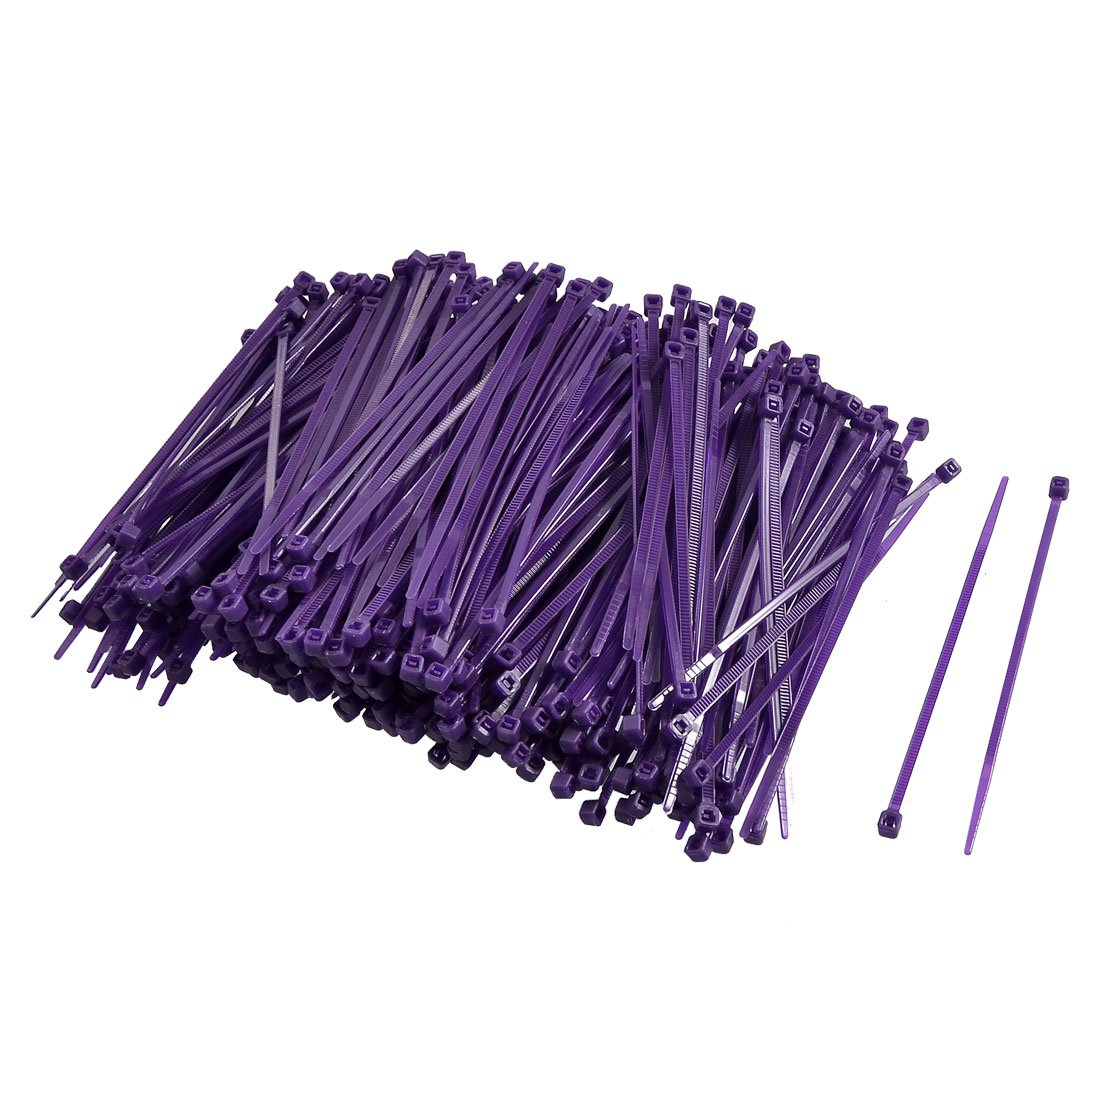 Uxcell Nylon Adjustable Self-locking Cable Ties, 2.5 x 100 mm, Purple, 500 Piece